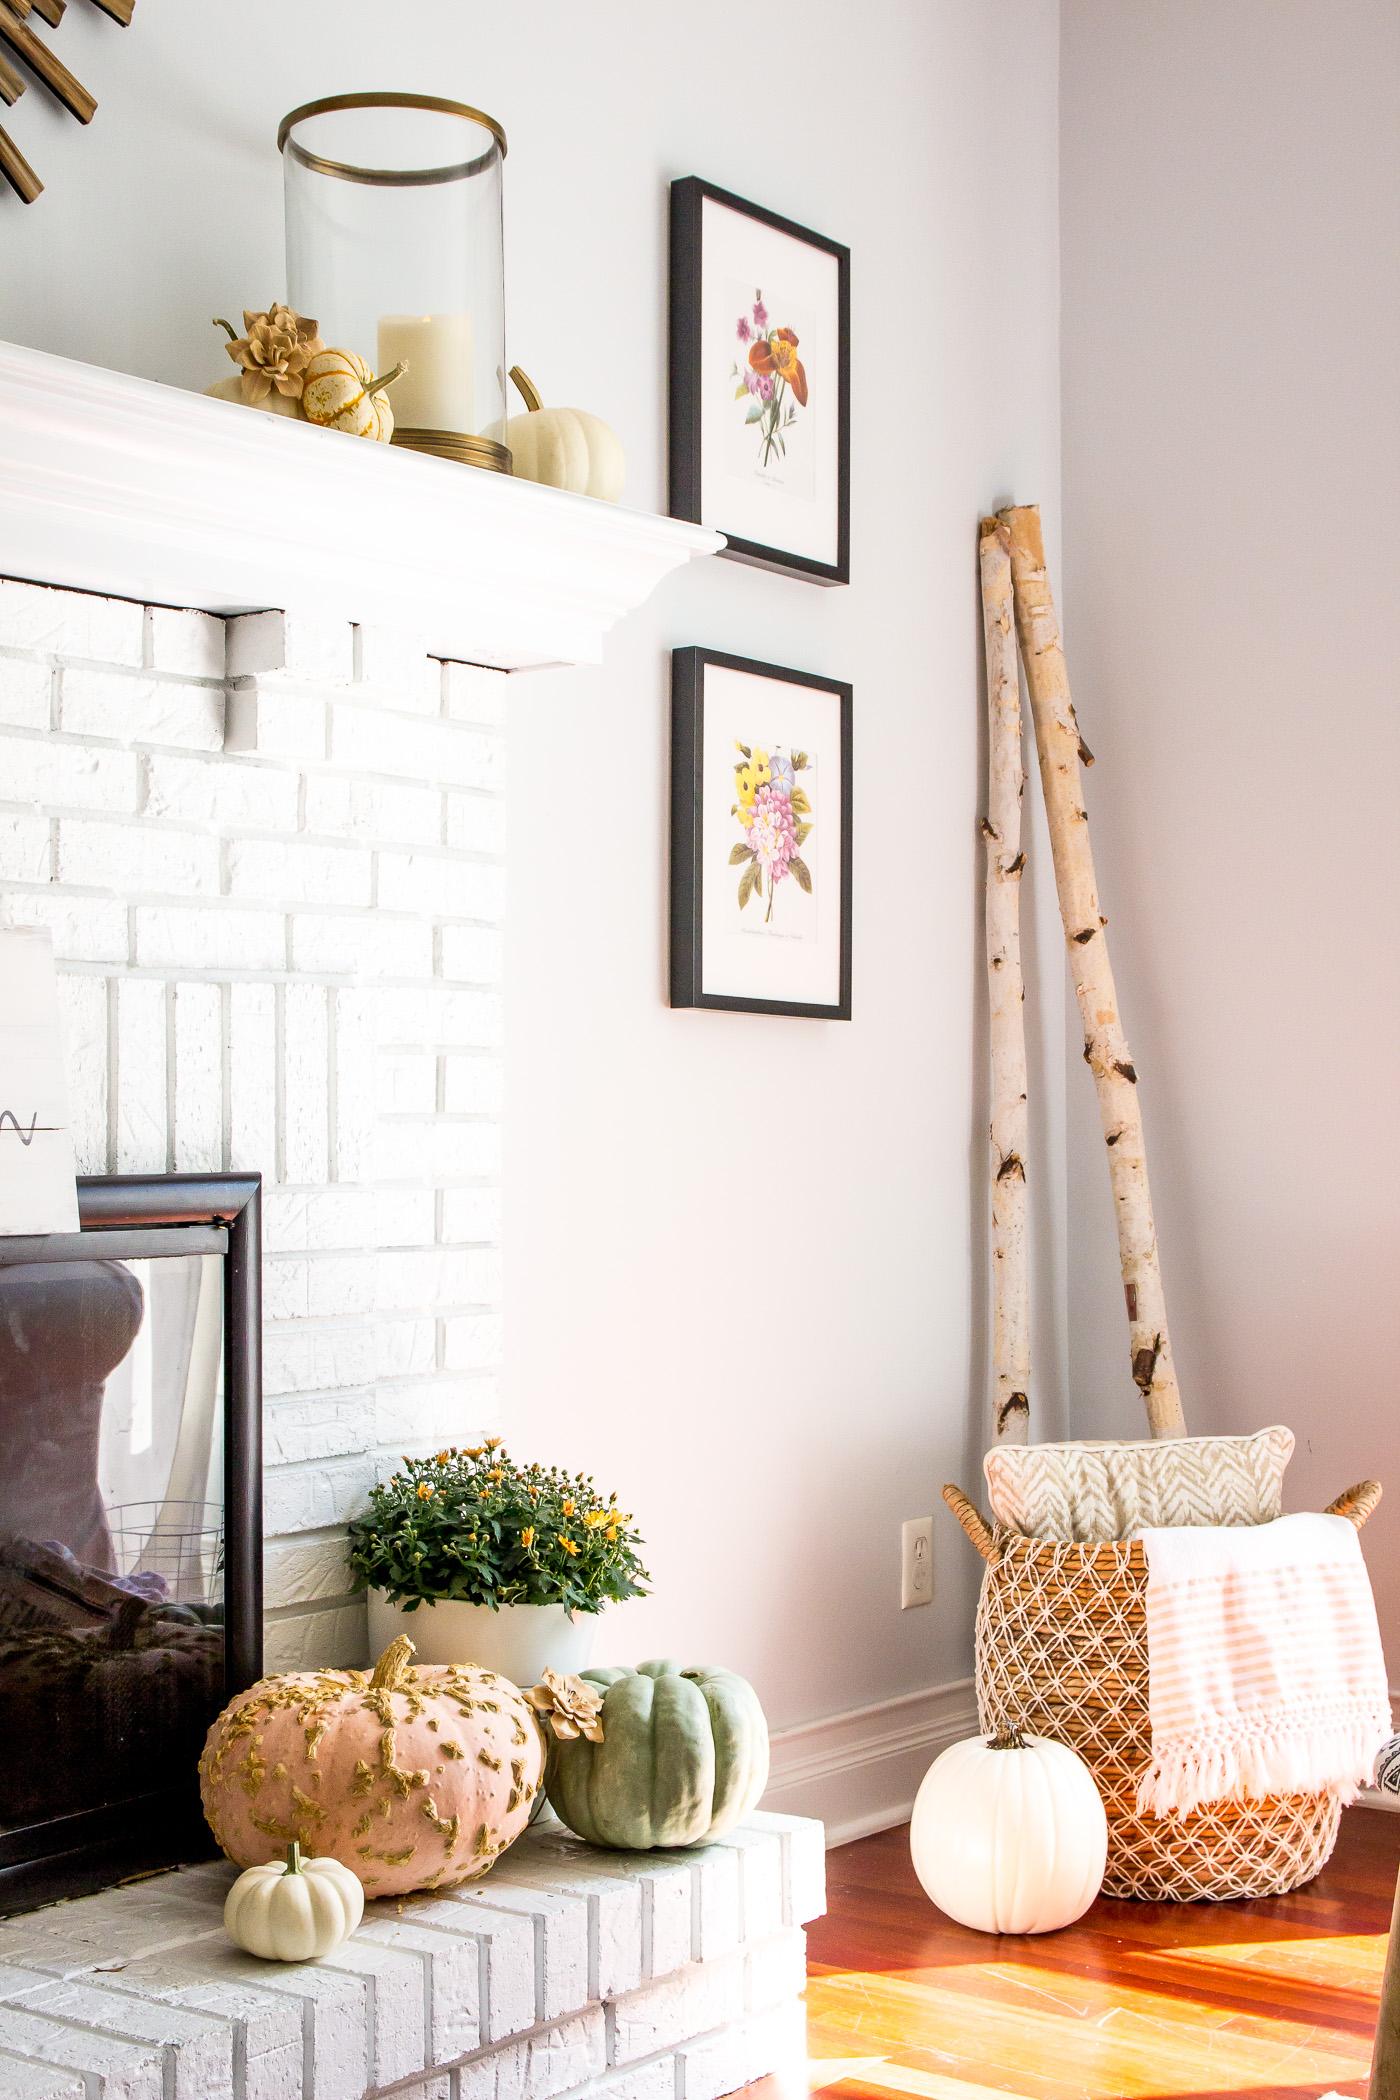 Tis Autumn Living Room Fall Decor Ideas: Fall Living Room Decor Shiningondesign (17 Of 41